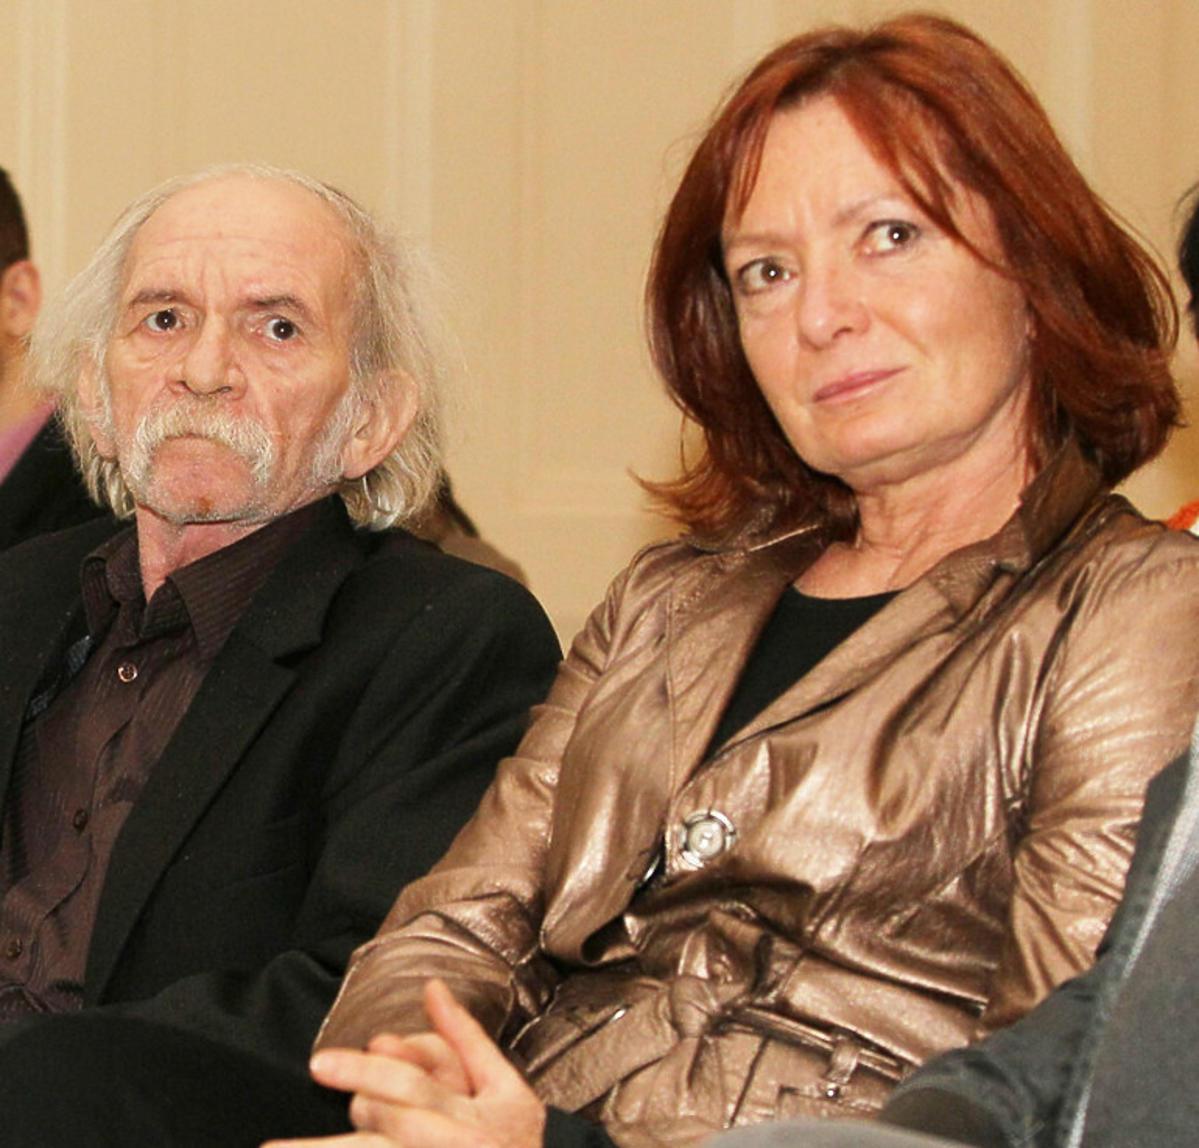 Kamila Sammler, żona Ryszarda kotysa i Bohdan Smoleń